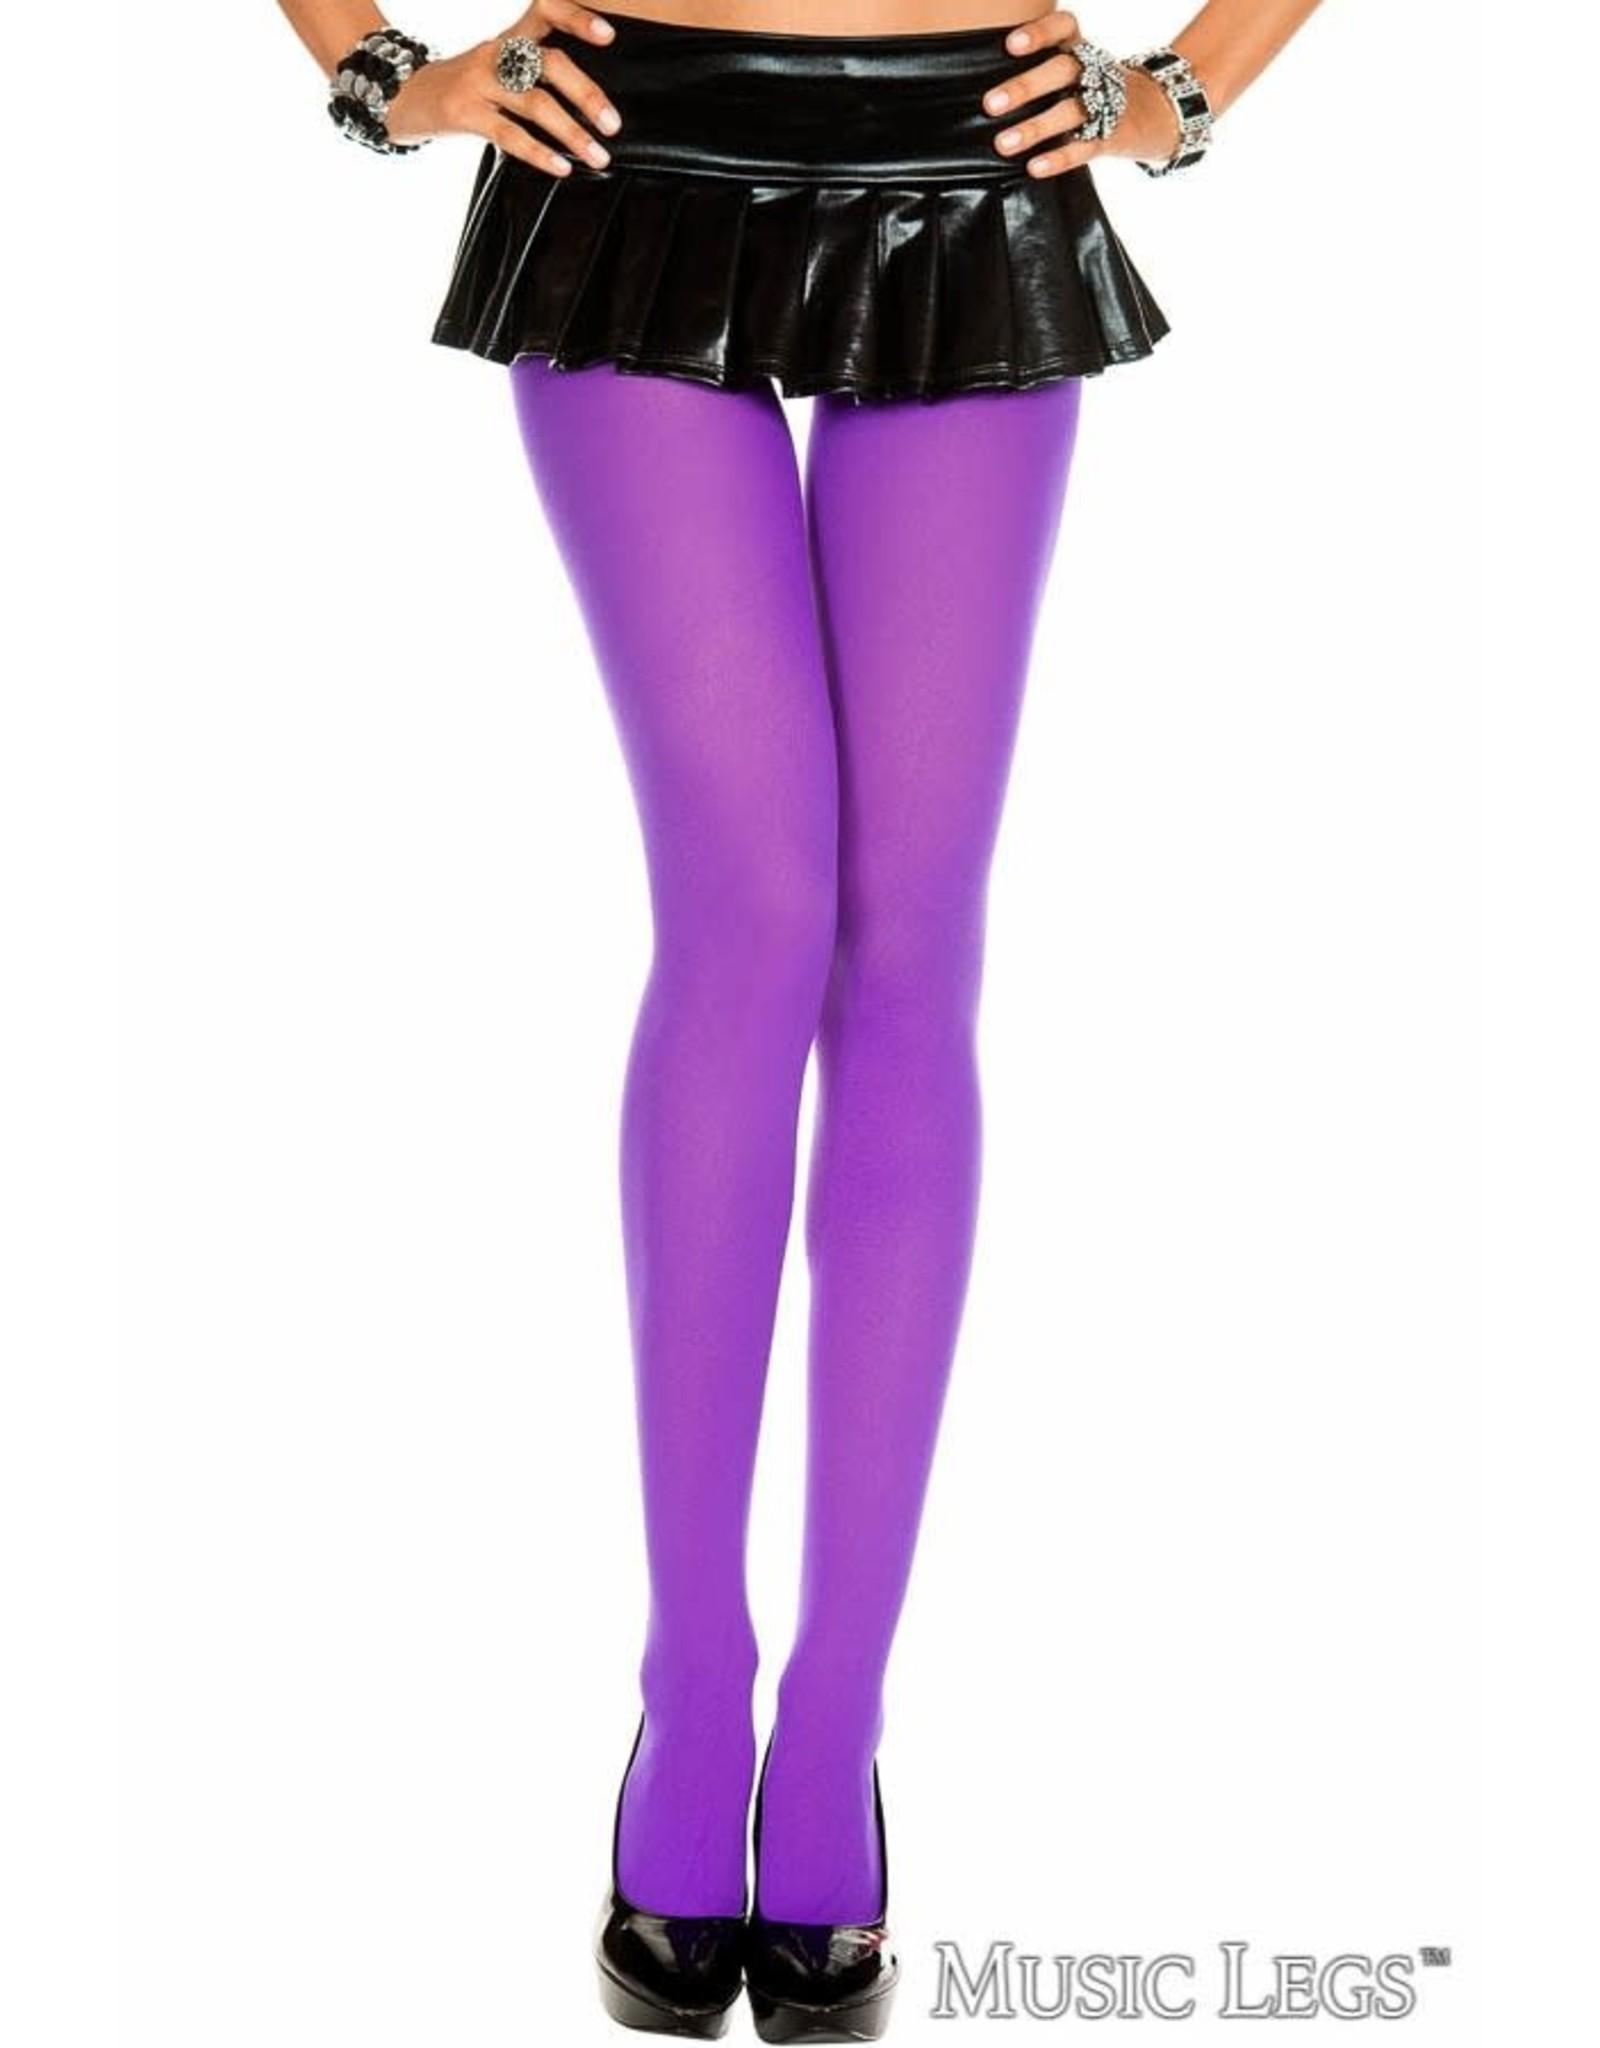 MUSIC LEGS - Purple Plus Size Opaque Tights